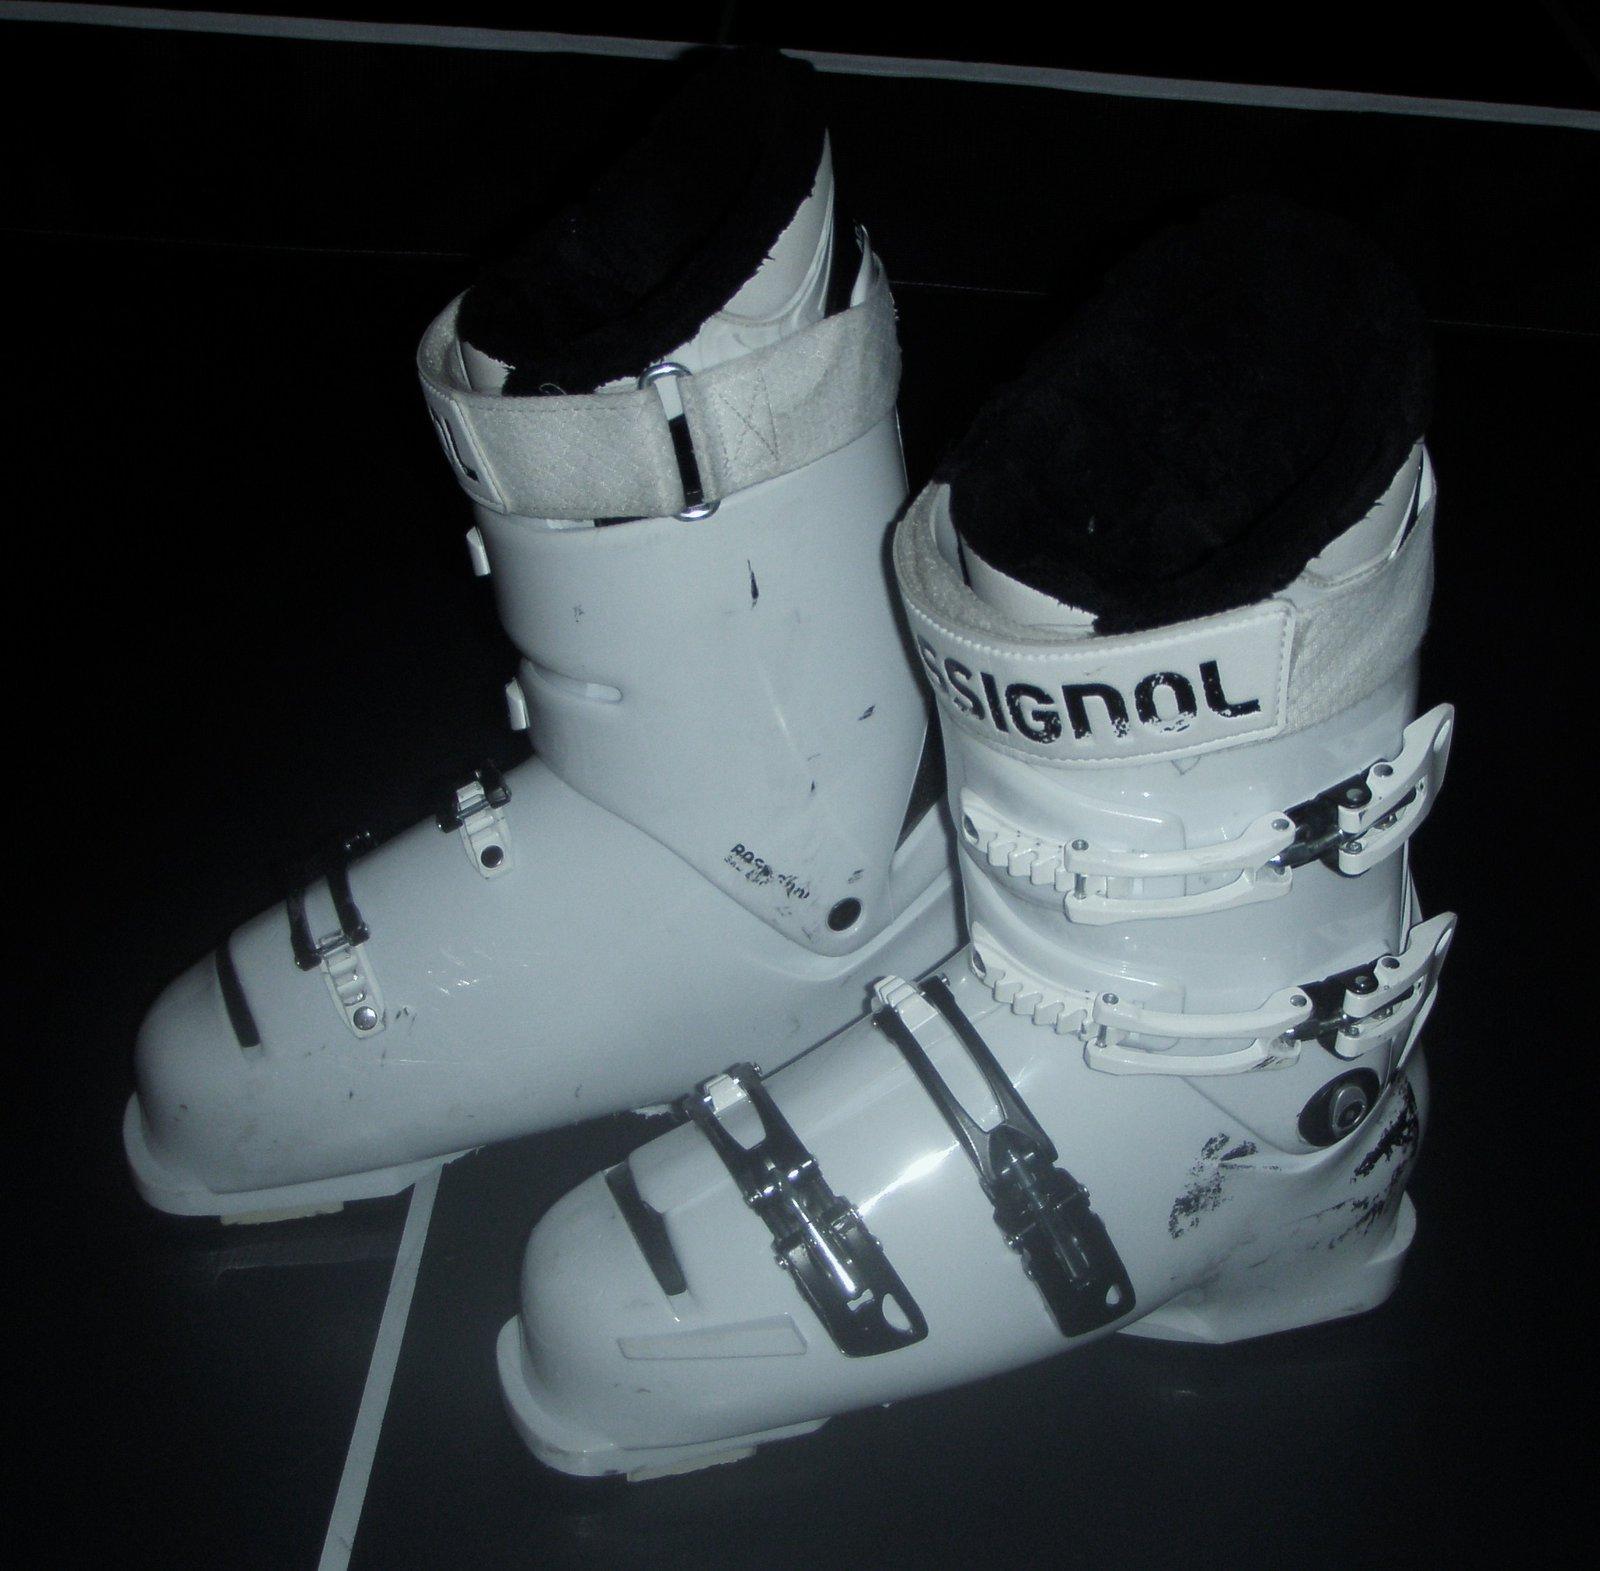 Rossignol SAS Pro 120 Ski Boots 27.5 Mens 9.5